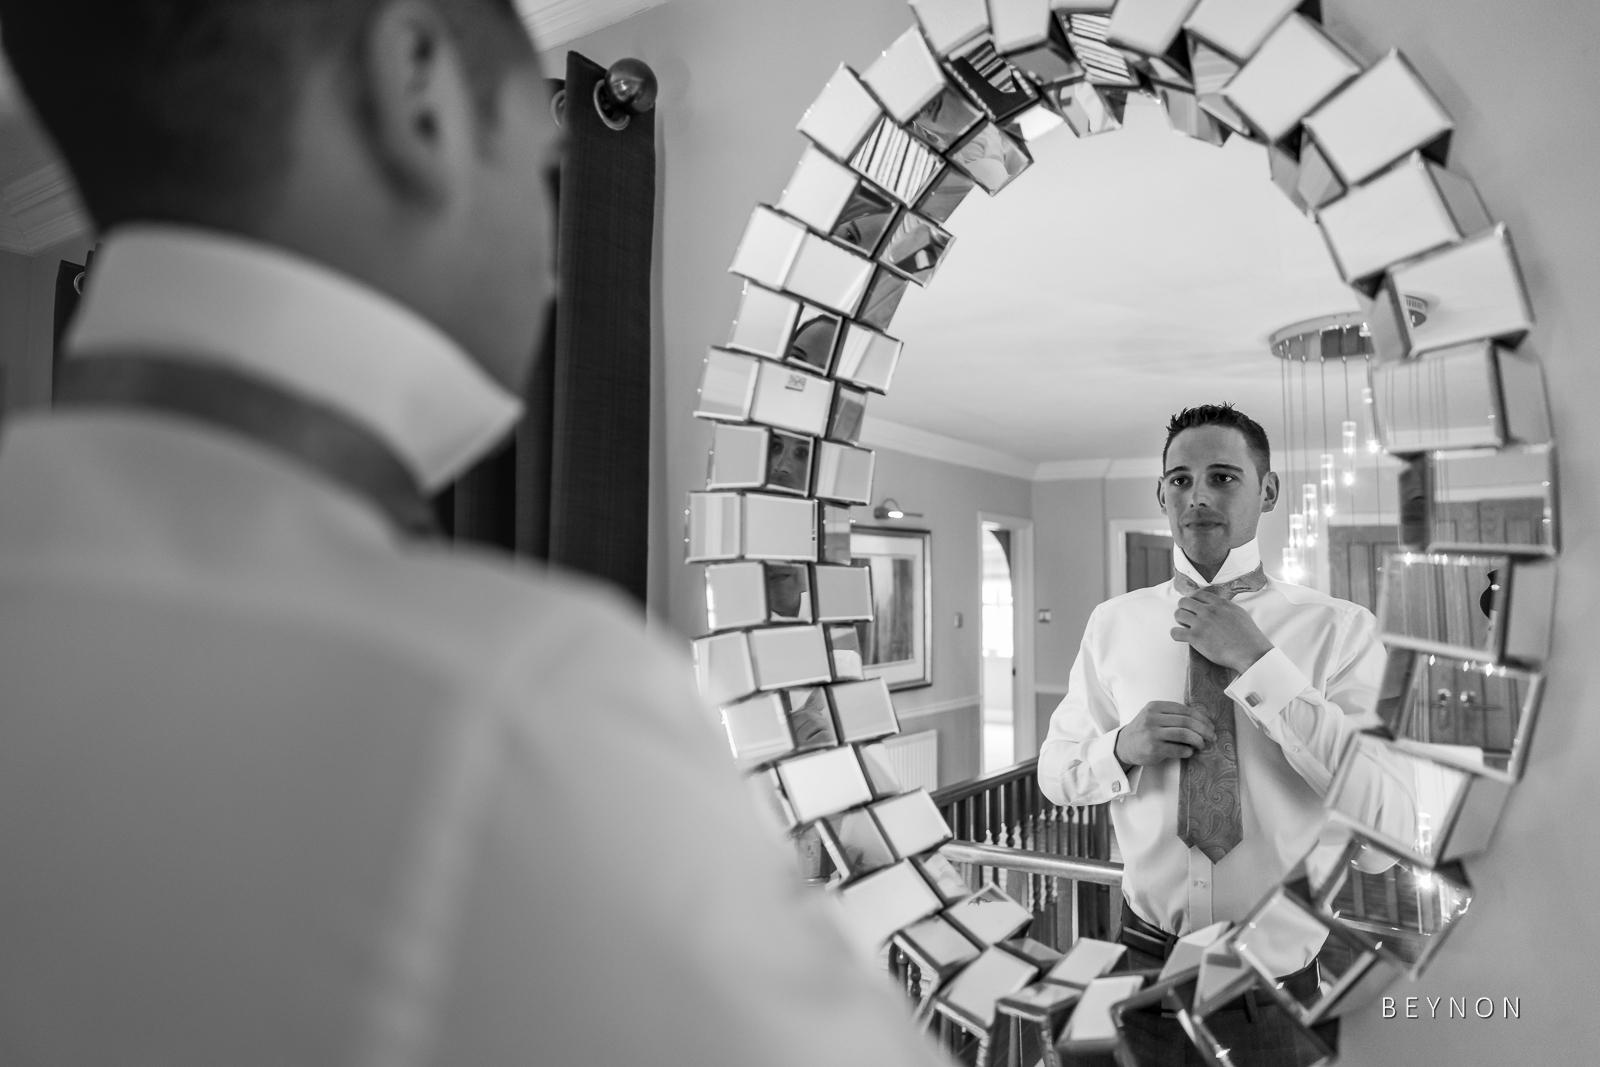 The brides brother ties his tie